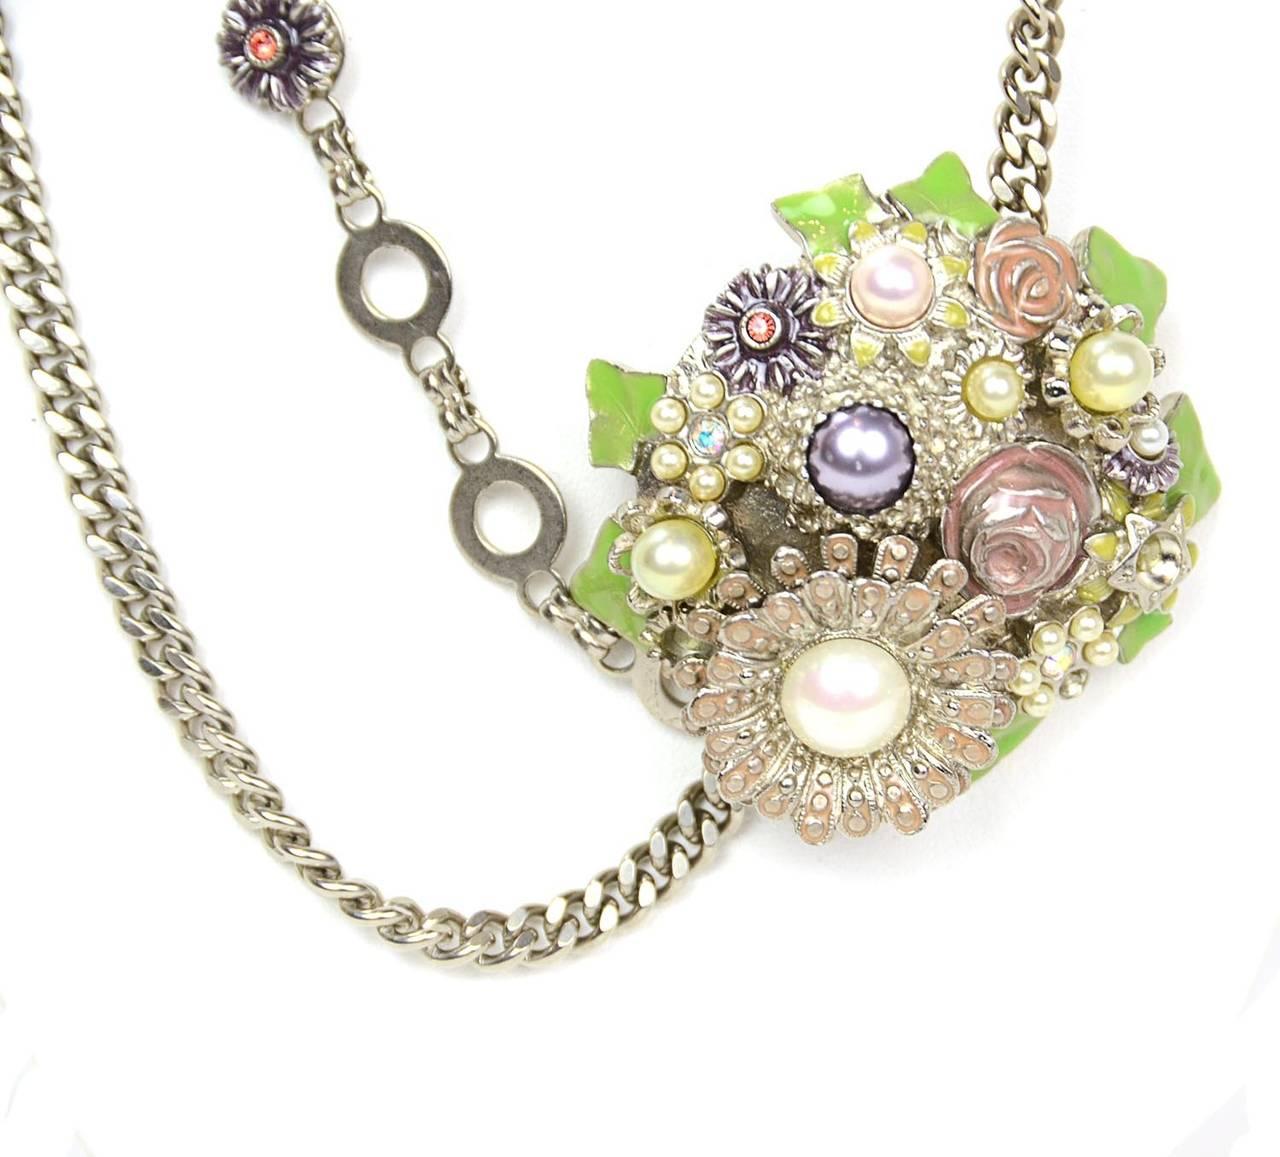 Chanel 2005 Silver Chain Link Belt/Necklace w/Flower & CC Pendants 2